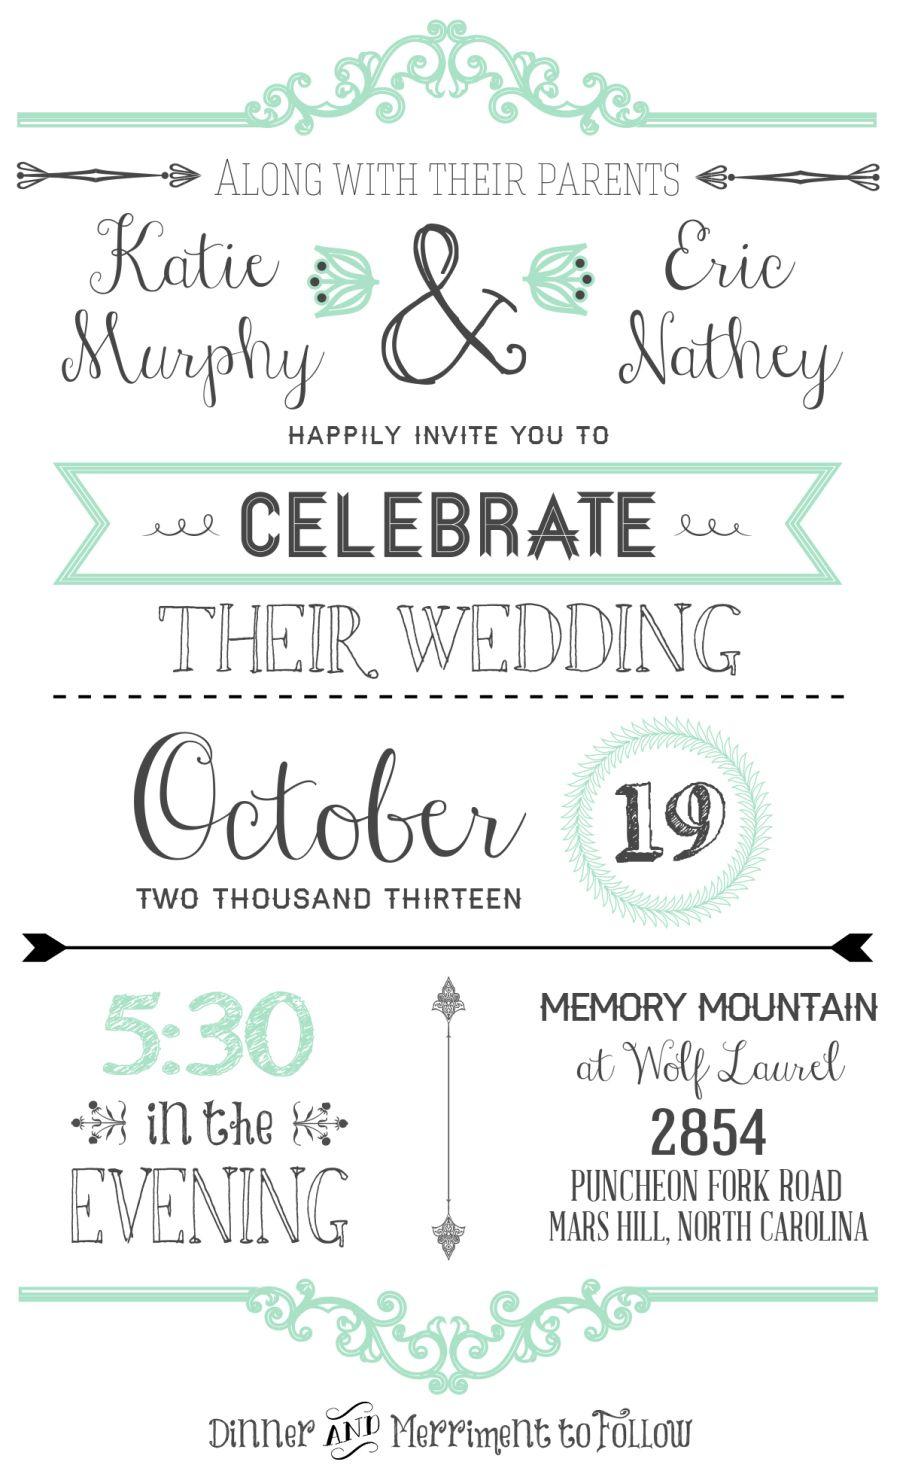 FREE Wedding Invitation Templates | Free wedding invitations, Free ...